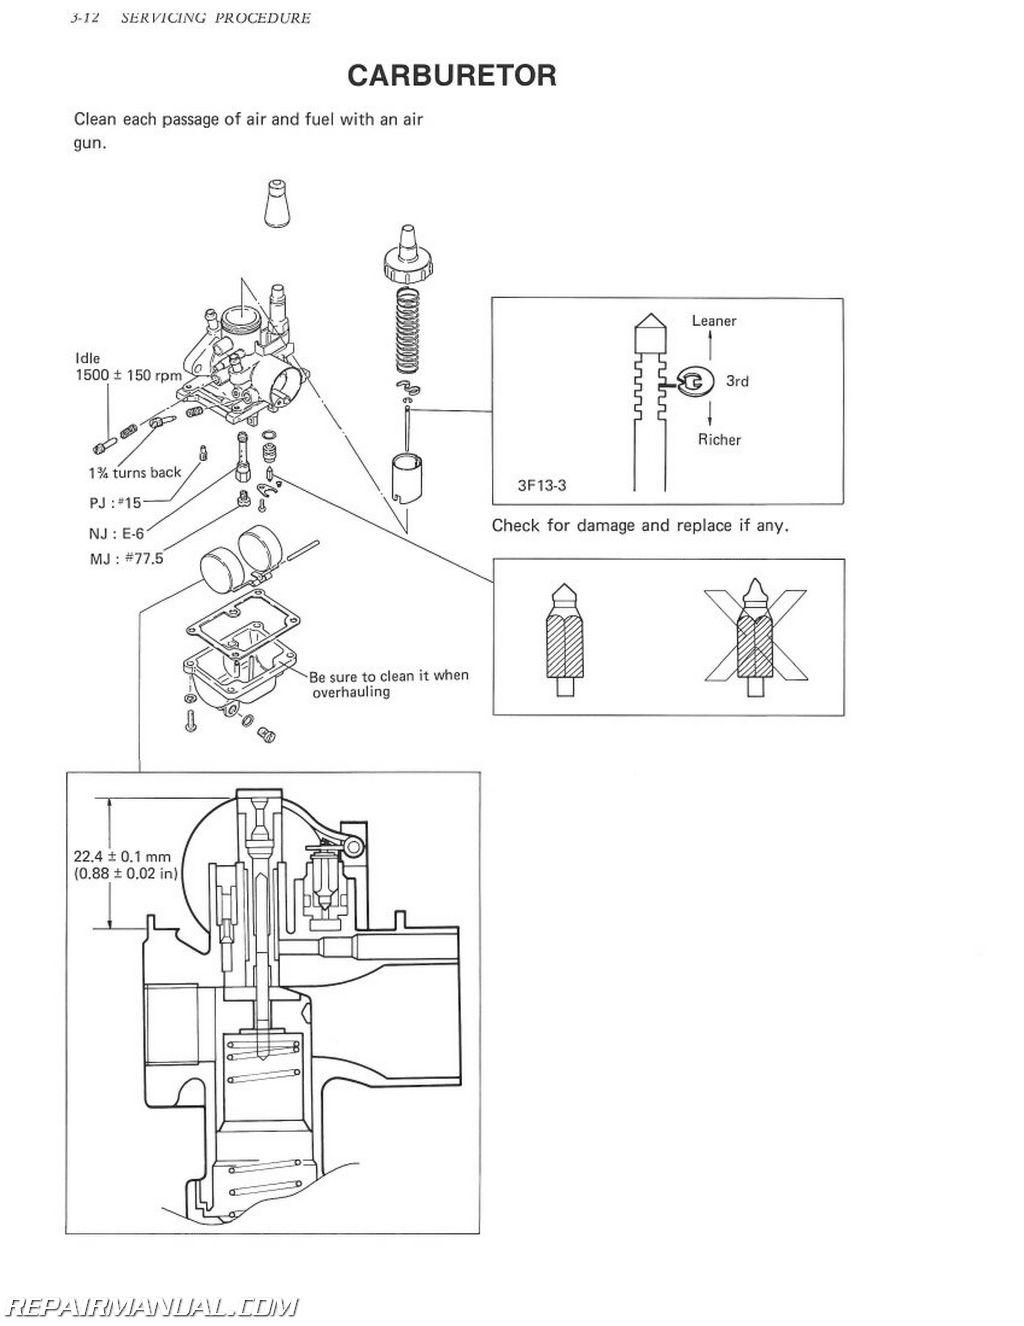 1980-1991 Suzuki FA50 Moped Service Manual | eBay | 1980 Suzuki Fa50 Wiring Diagram |  | eBay